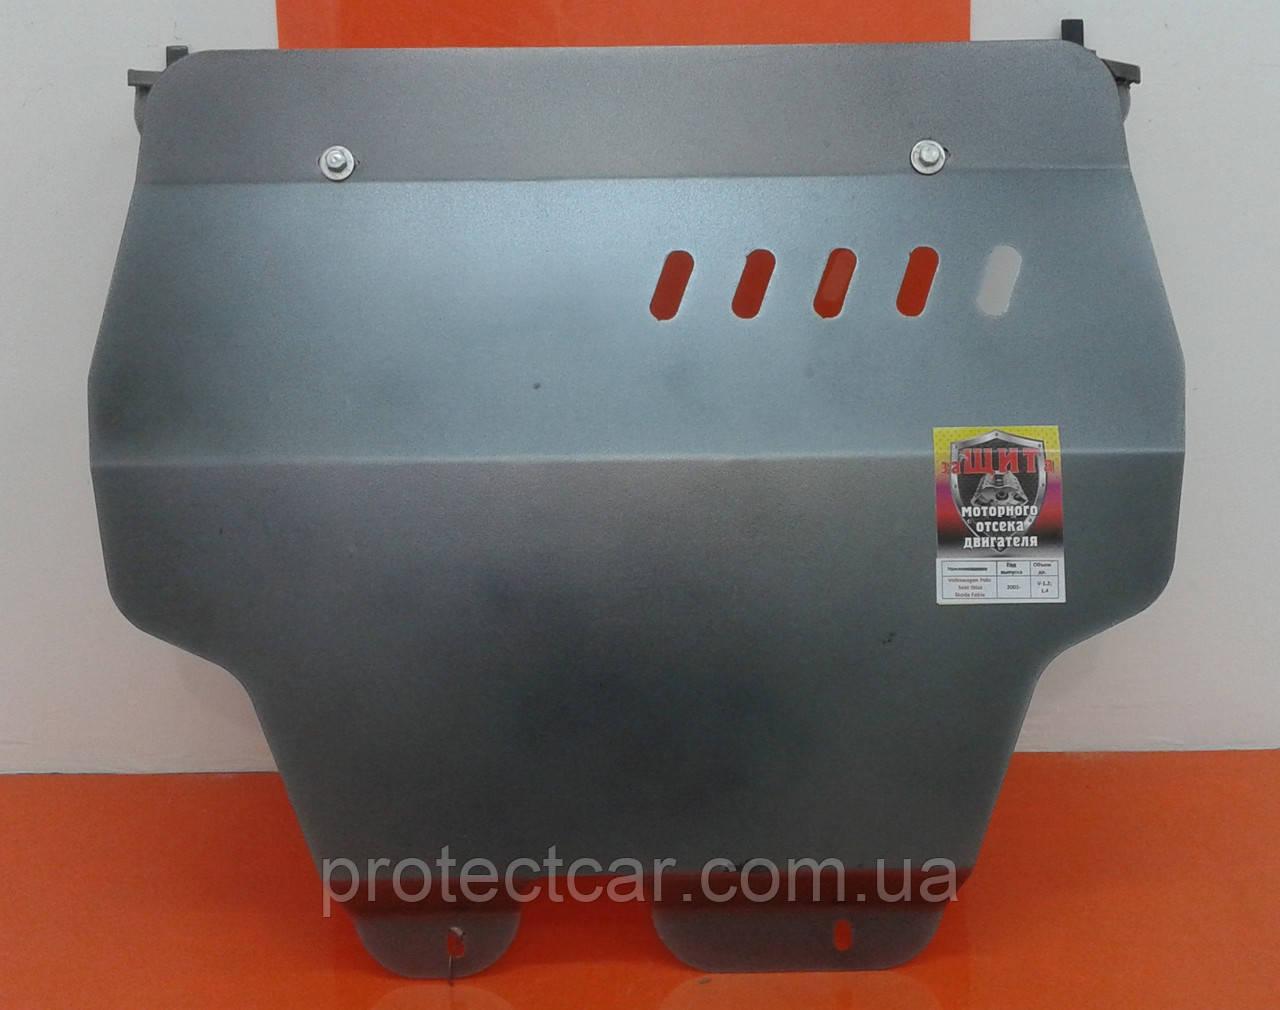 Защита двигателя Skoda Roomster (2006-2015) бензин